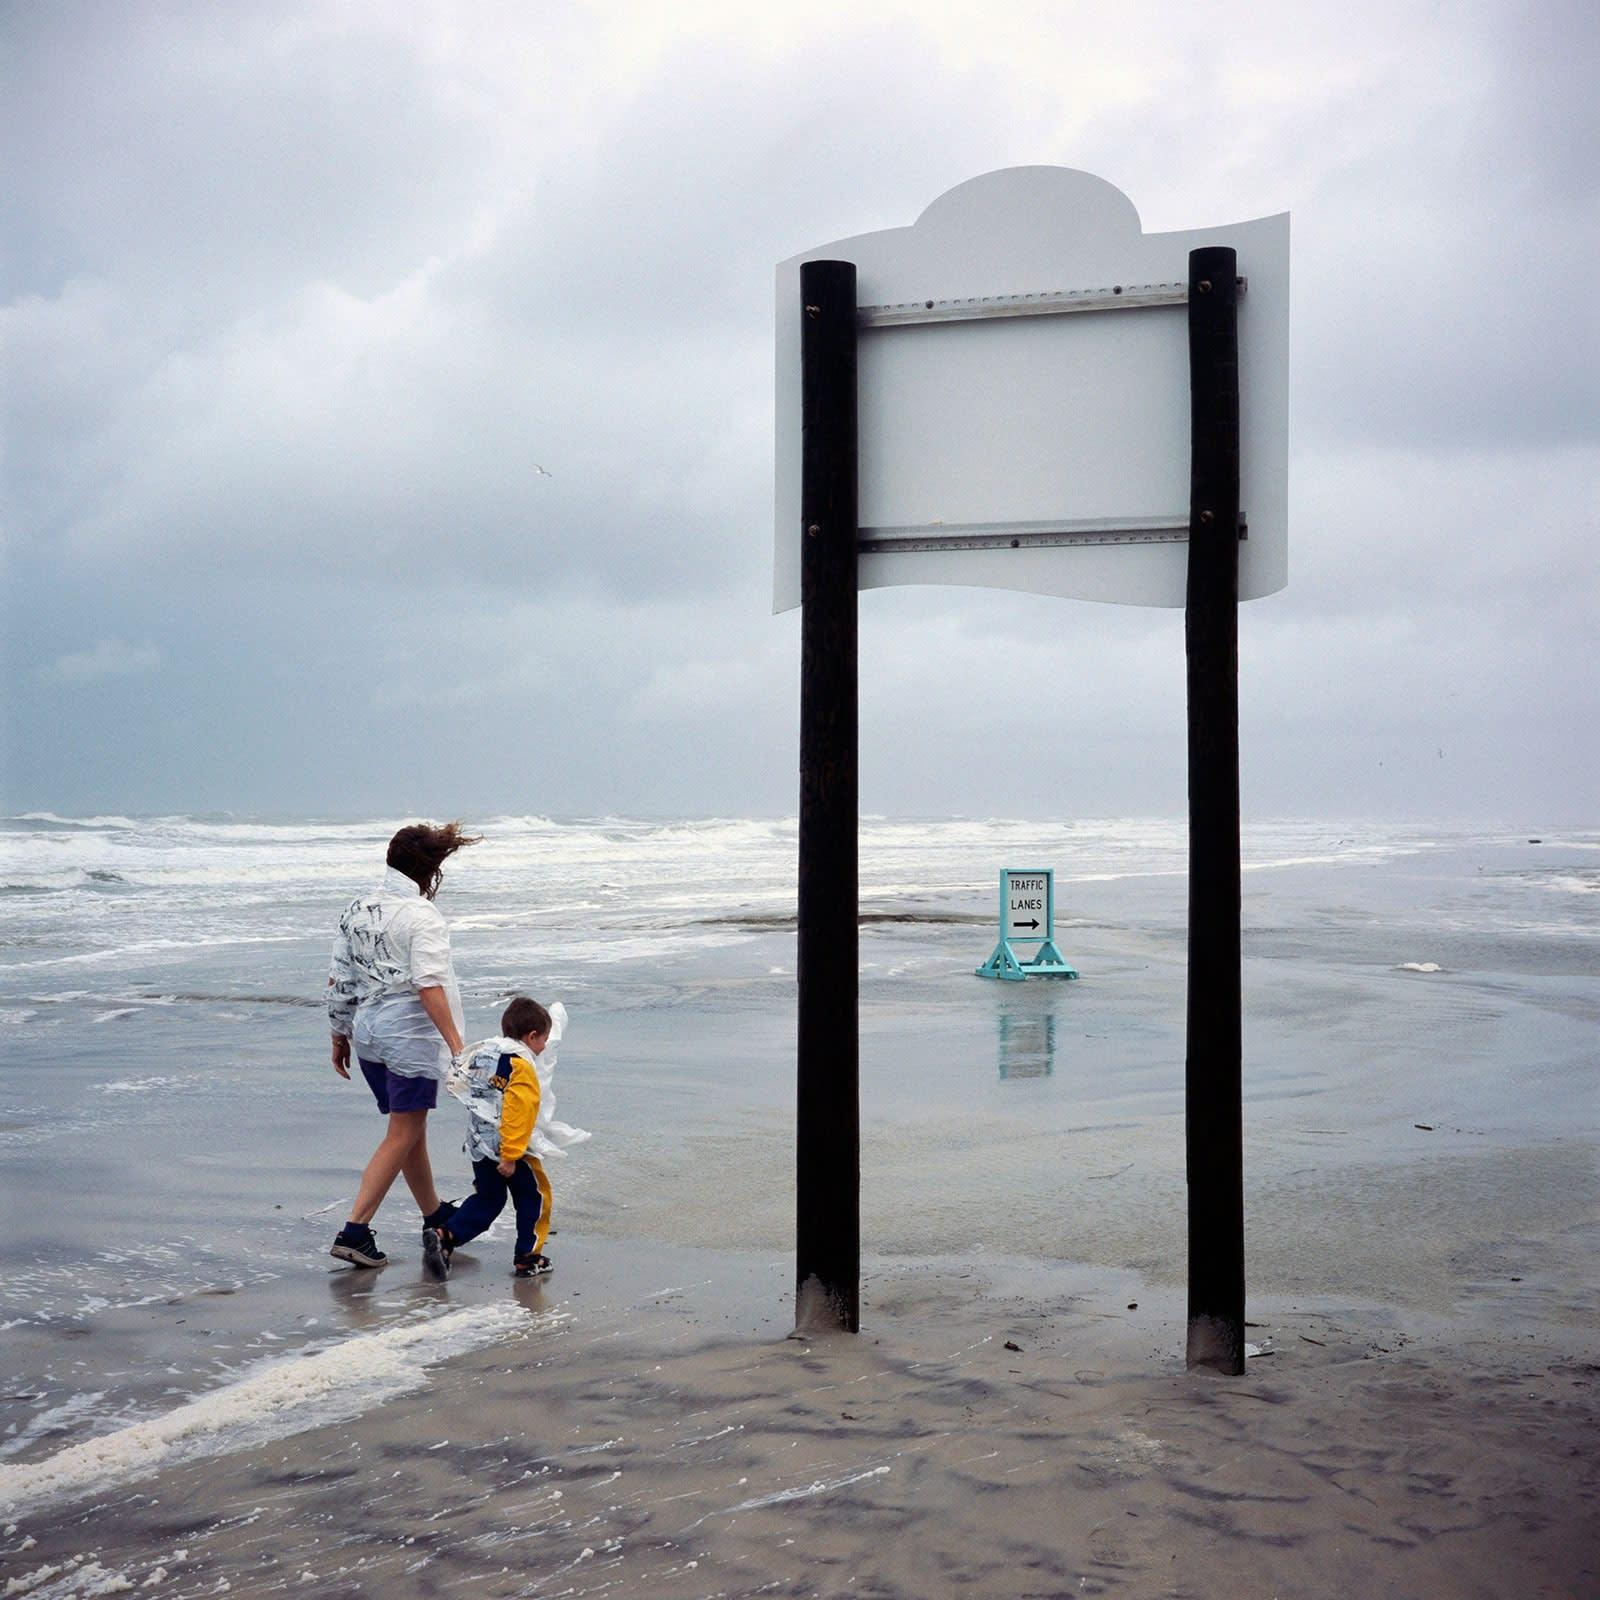 Jean-Christophe Béchet, Daytona Beach, Floride #1, 2002